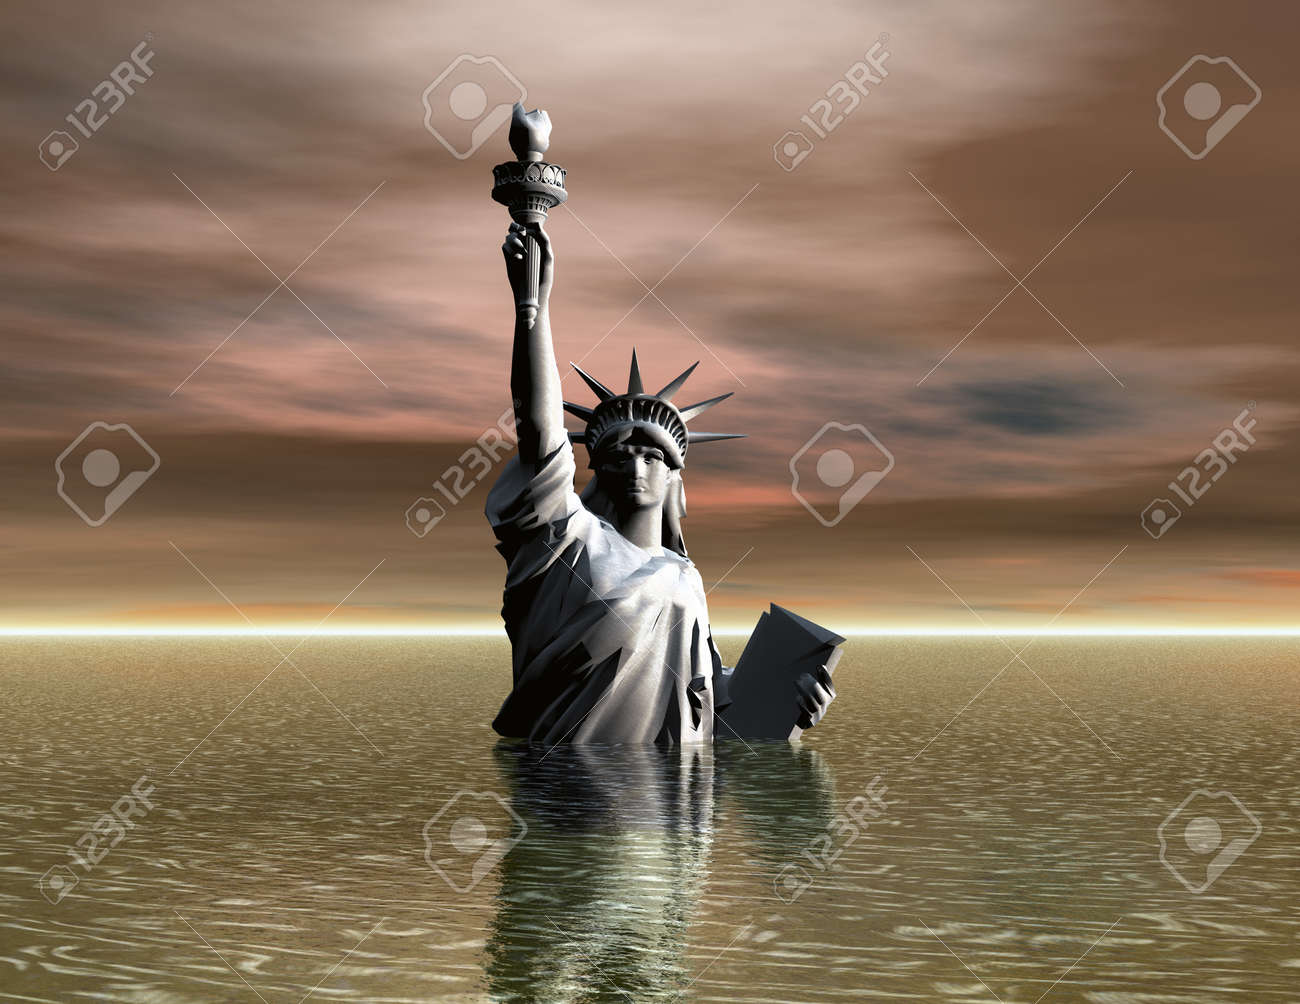 Digital Illustration of the Liberty Statue - 21809911